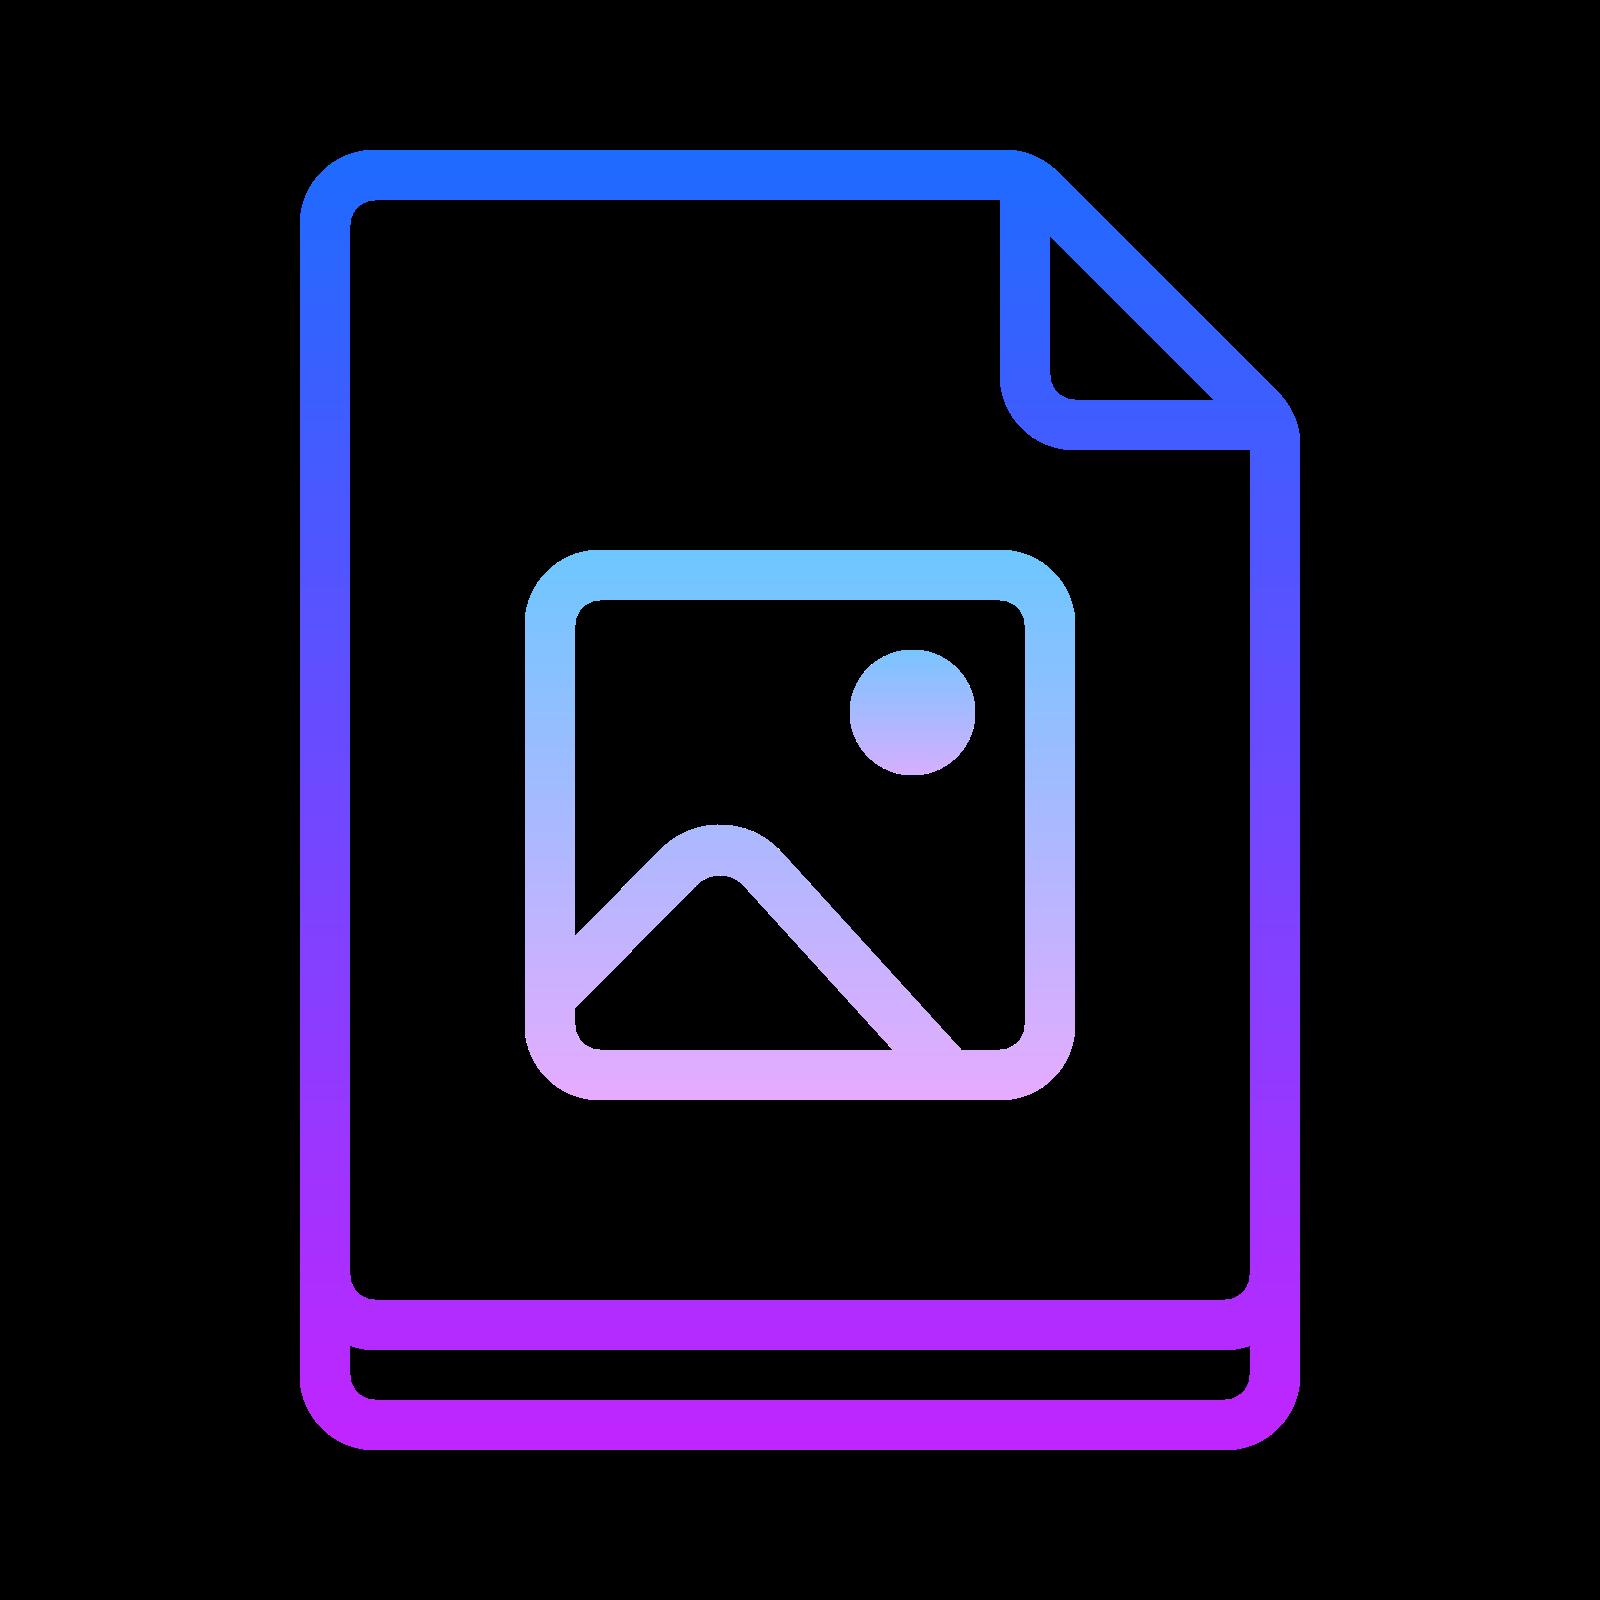 Plik obrazu  icon